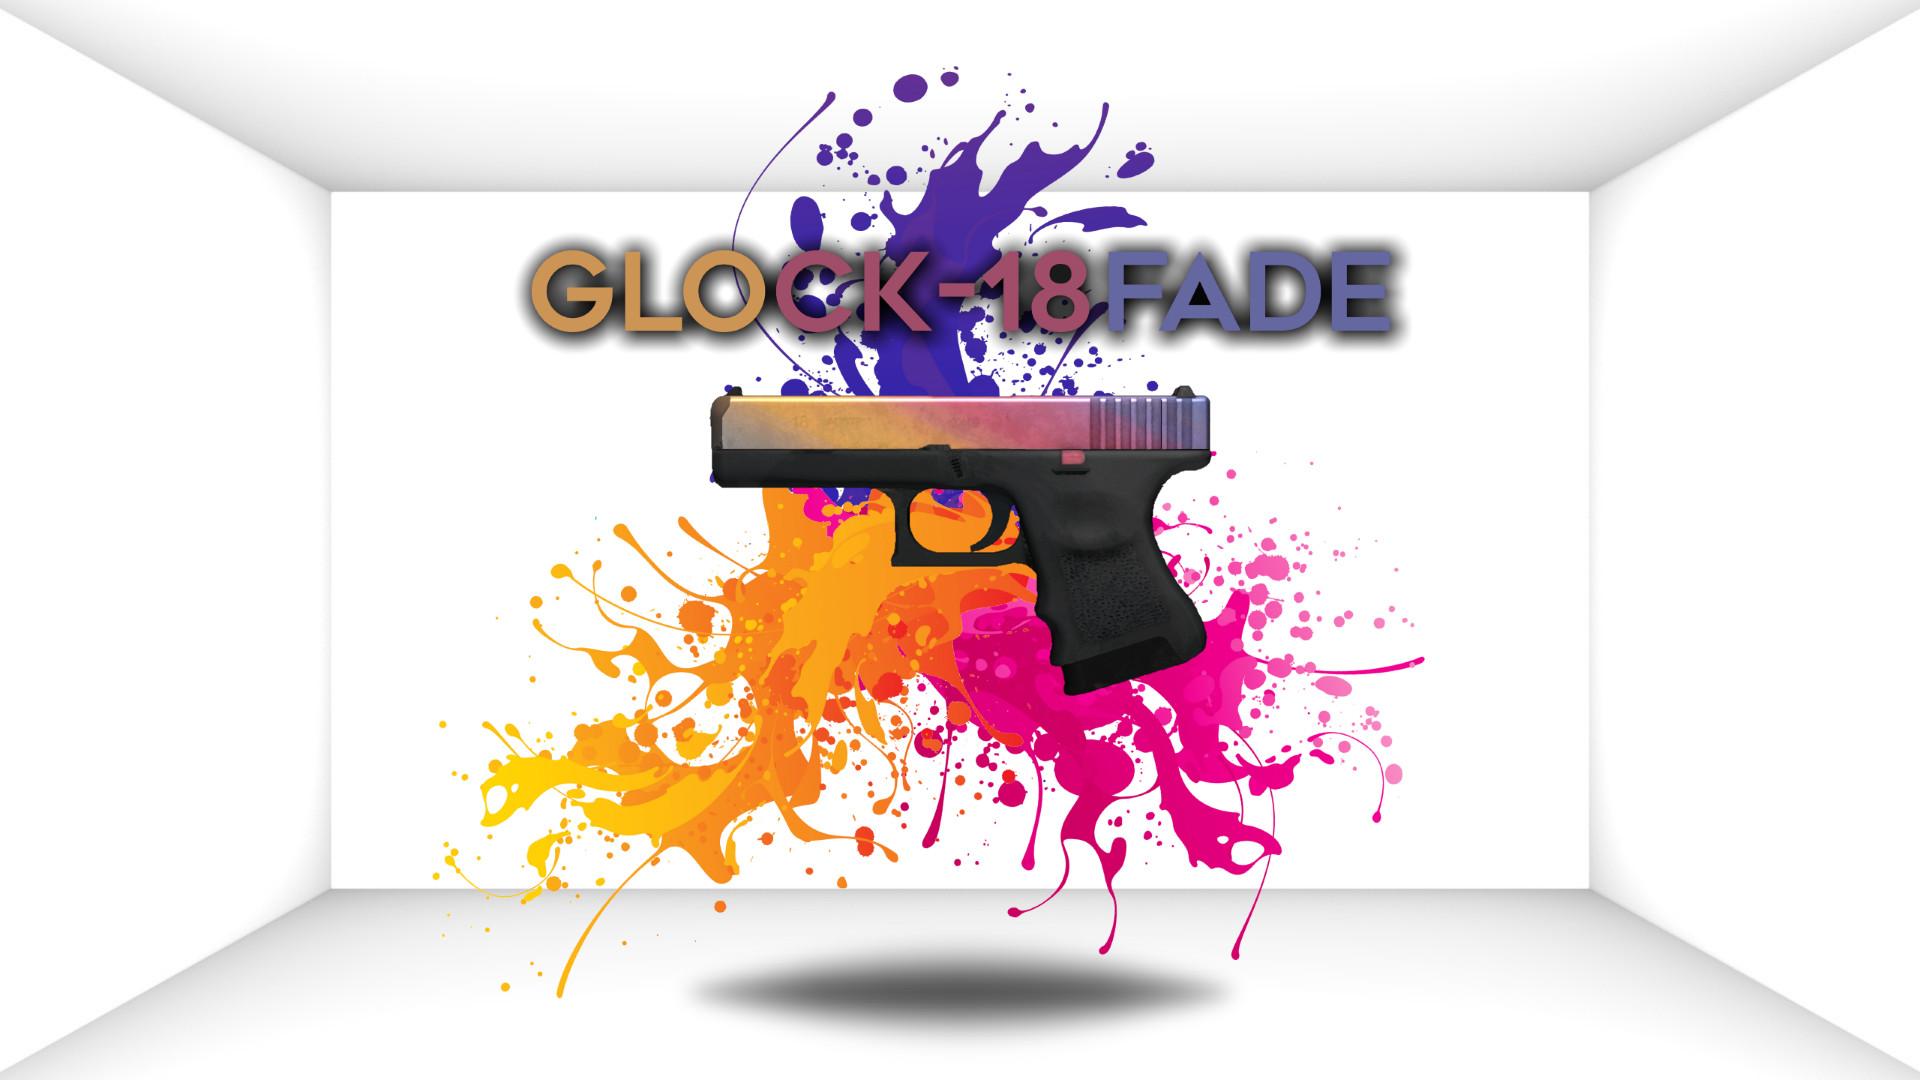 Res: 1920x1080, Glock-18 Fade